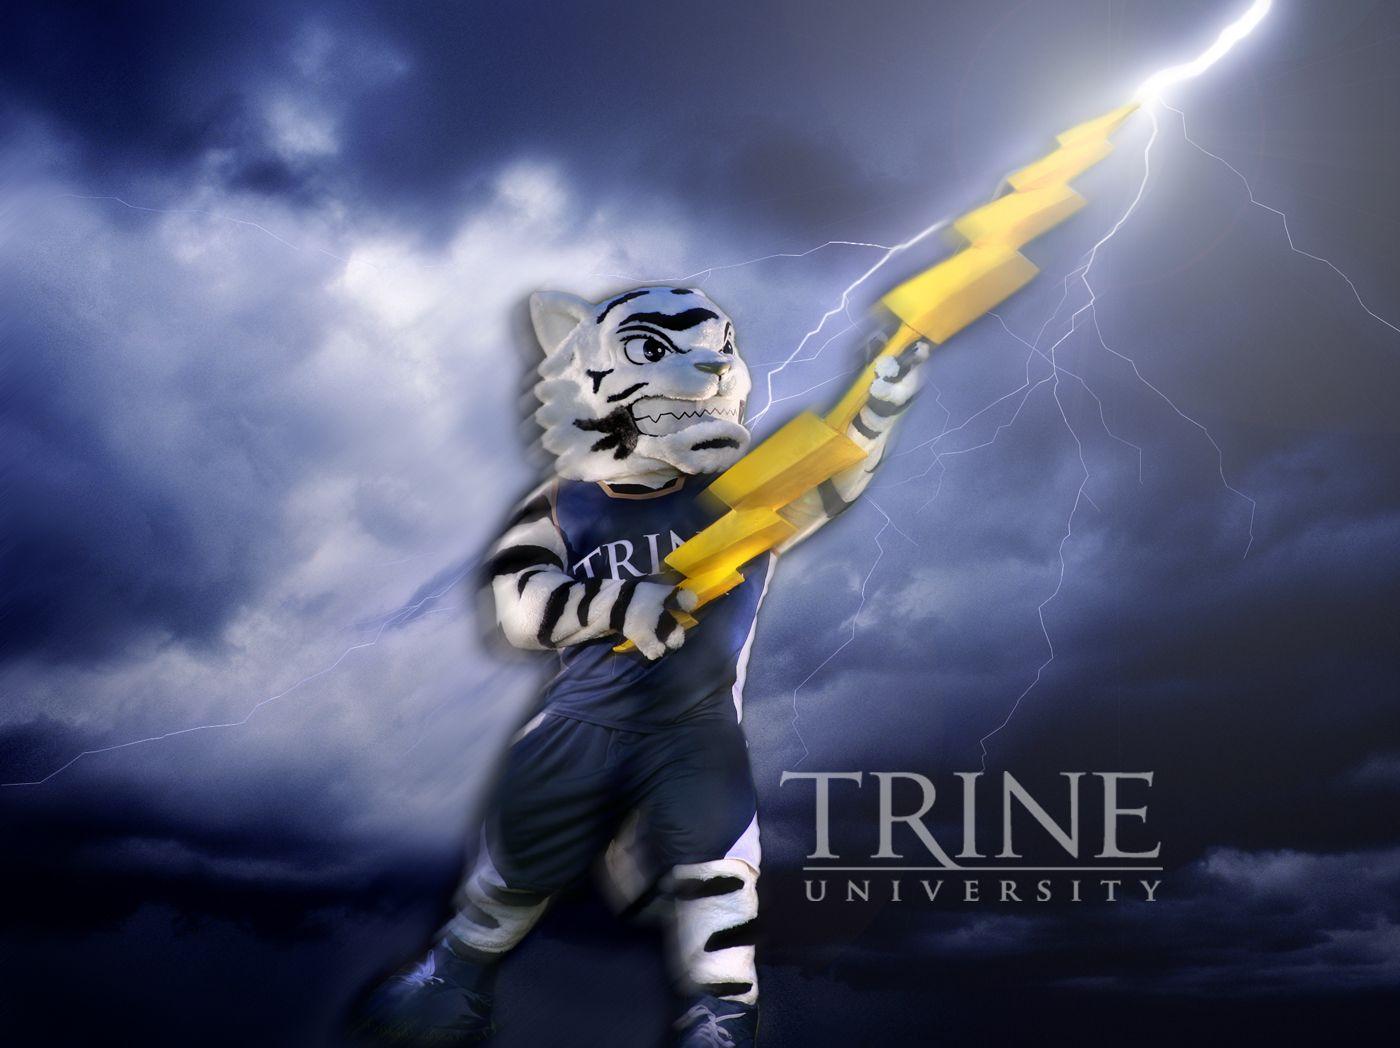 Trine University Mario Halloween 2020 Trine University's mascot Storm! | University, Storm, Thunder